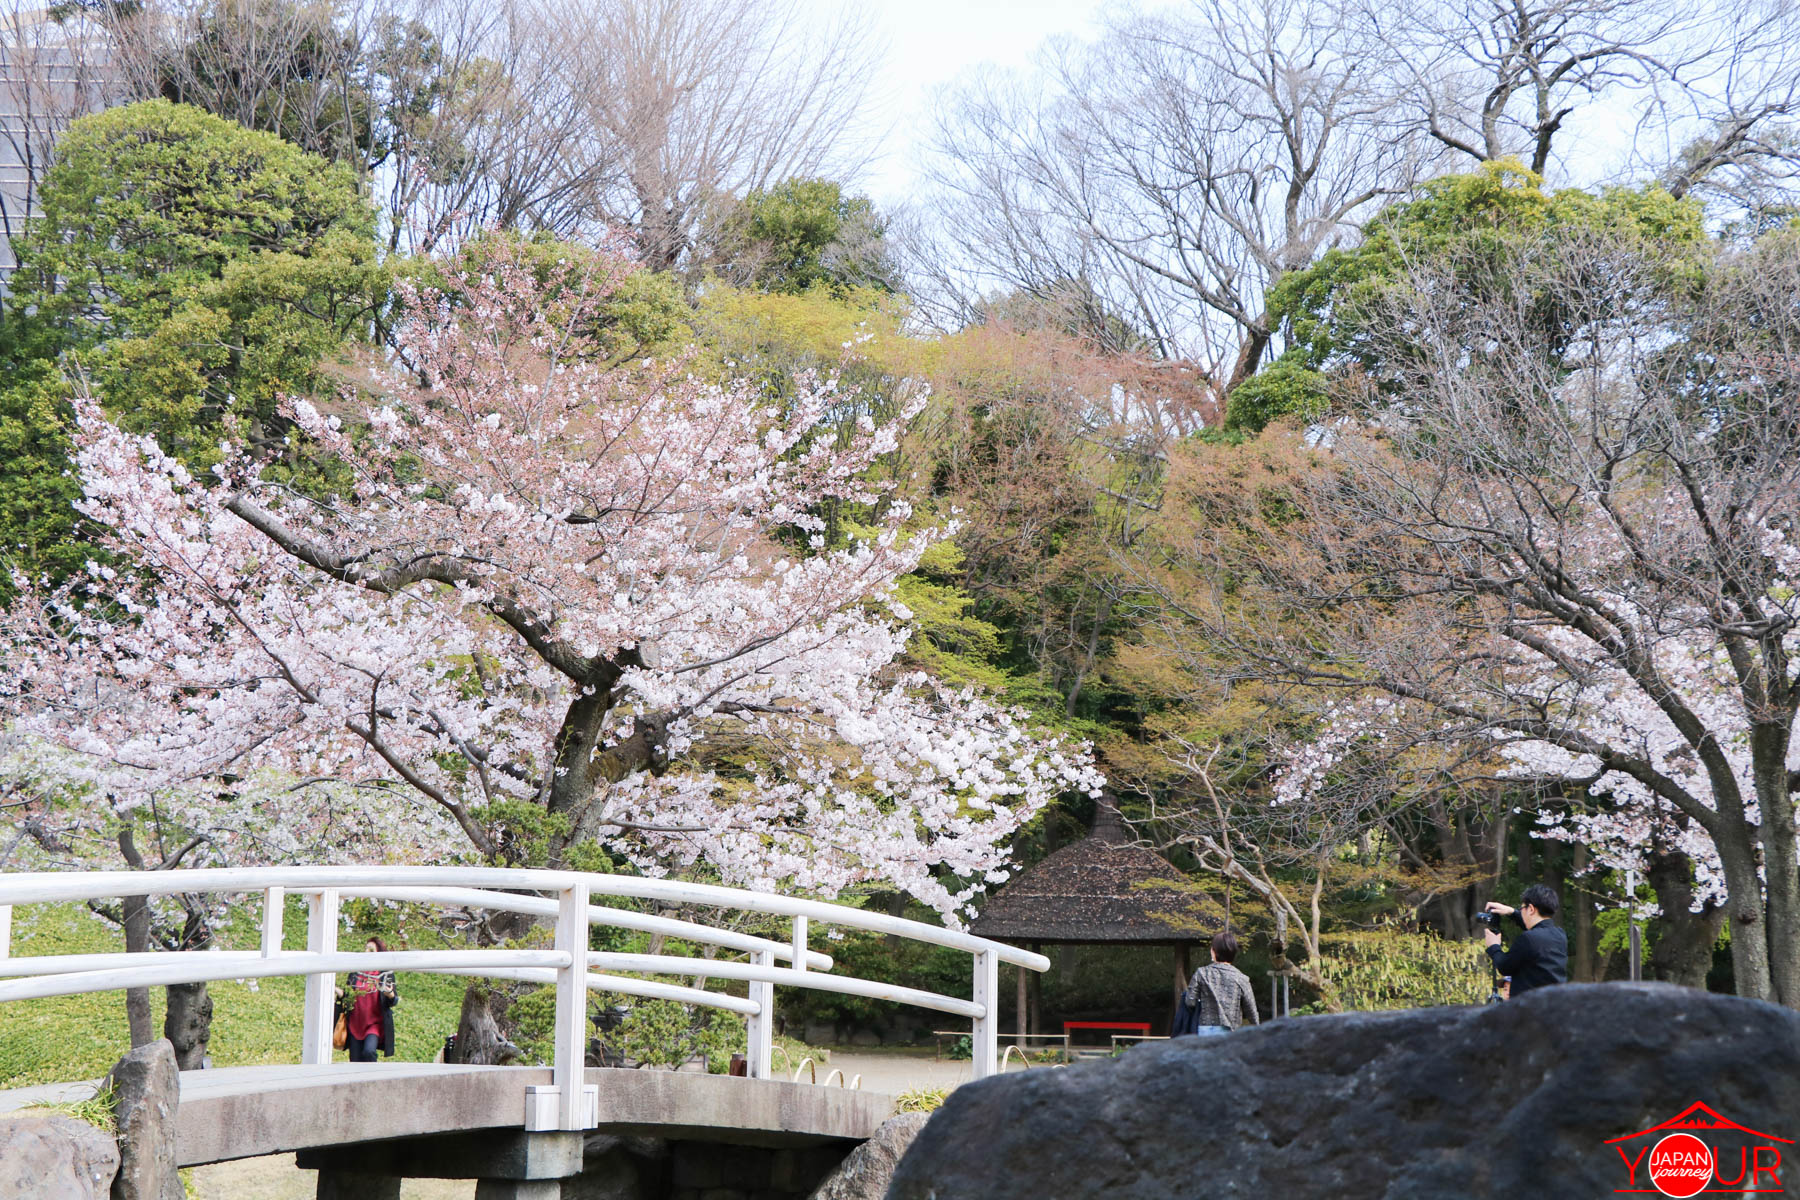 Japan Cherry Blossom Forecast 2019 - Koishikawa Korakuen Park